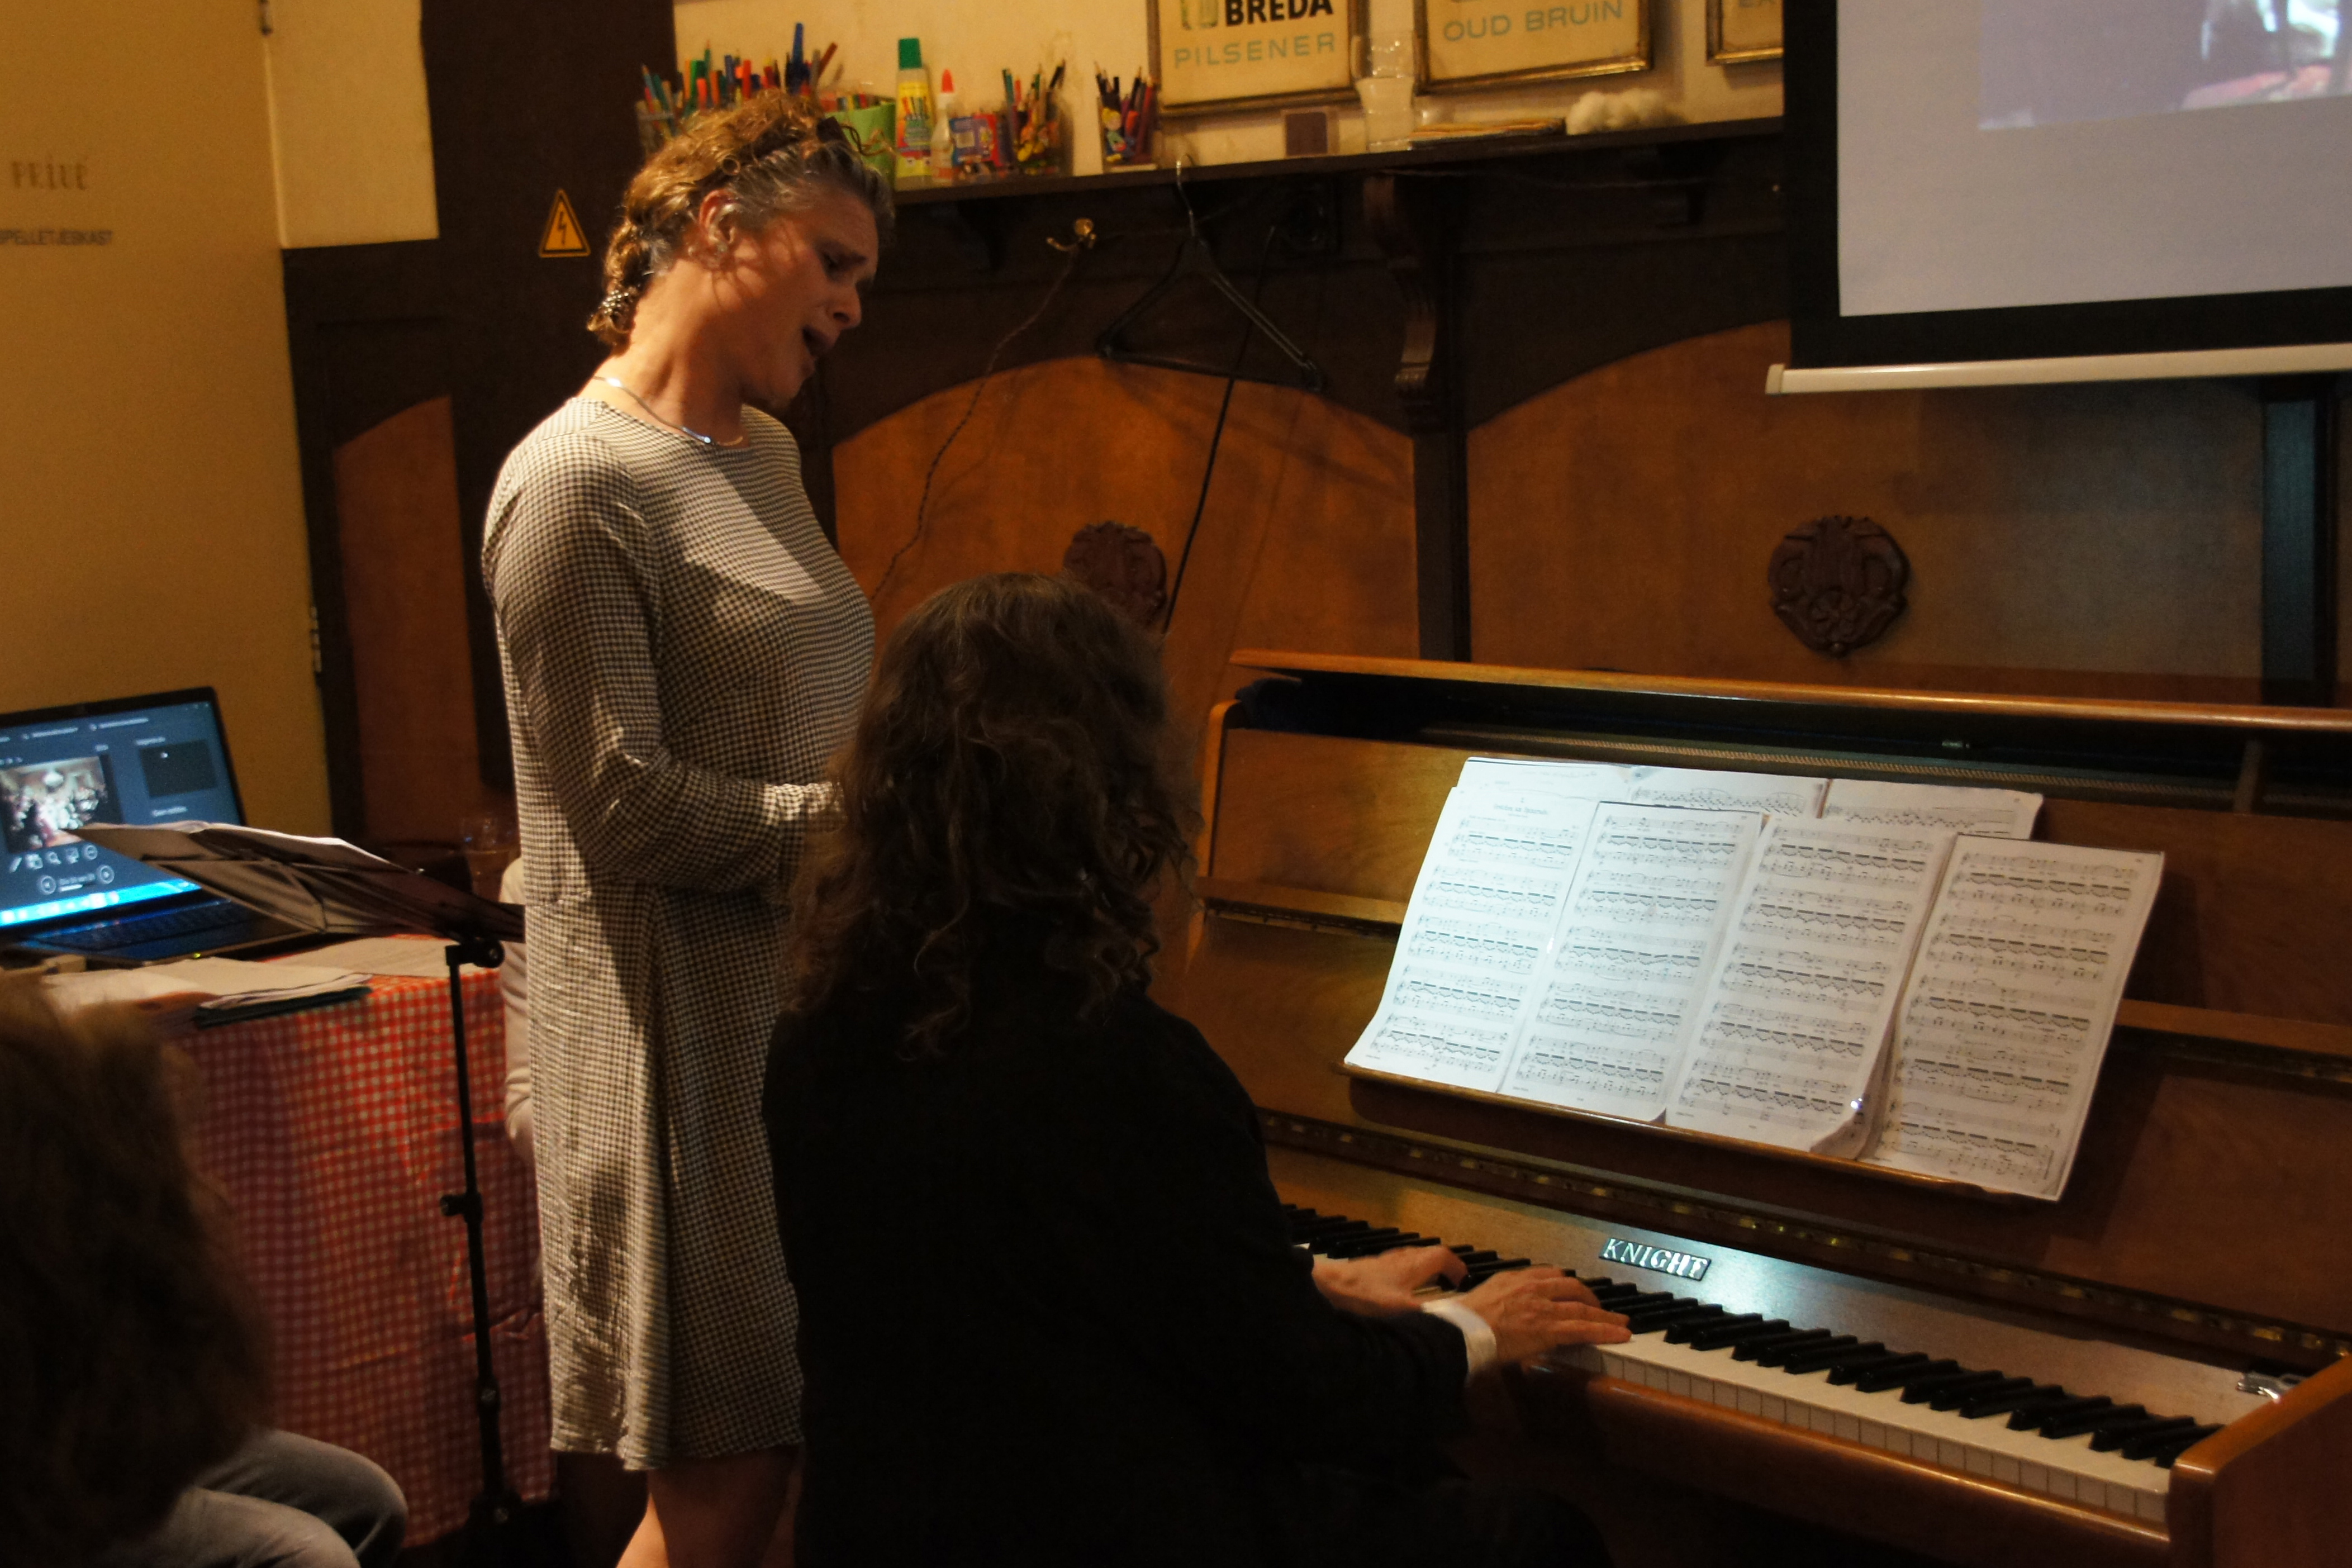 klassieke muziek en zang